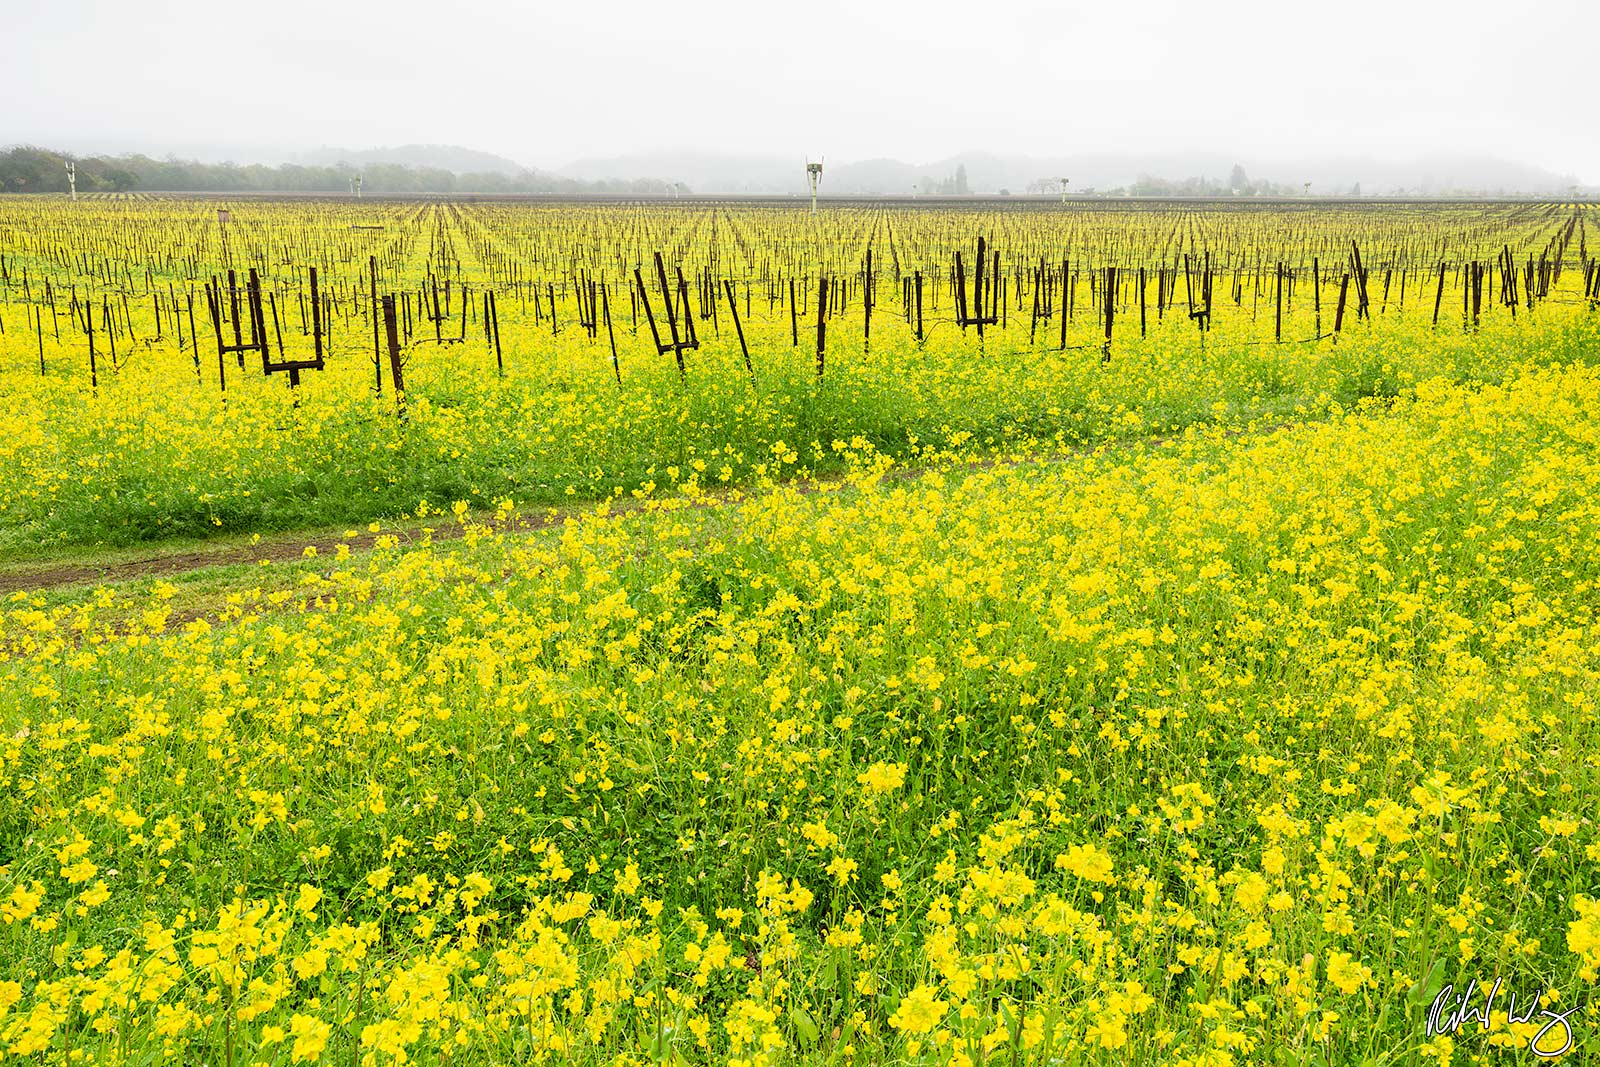 Mustard Flowers in Vineyard, Yountville, California, photo